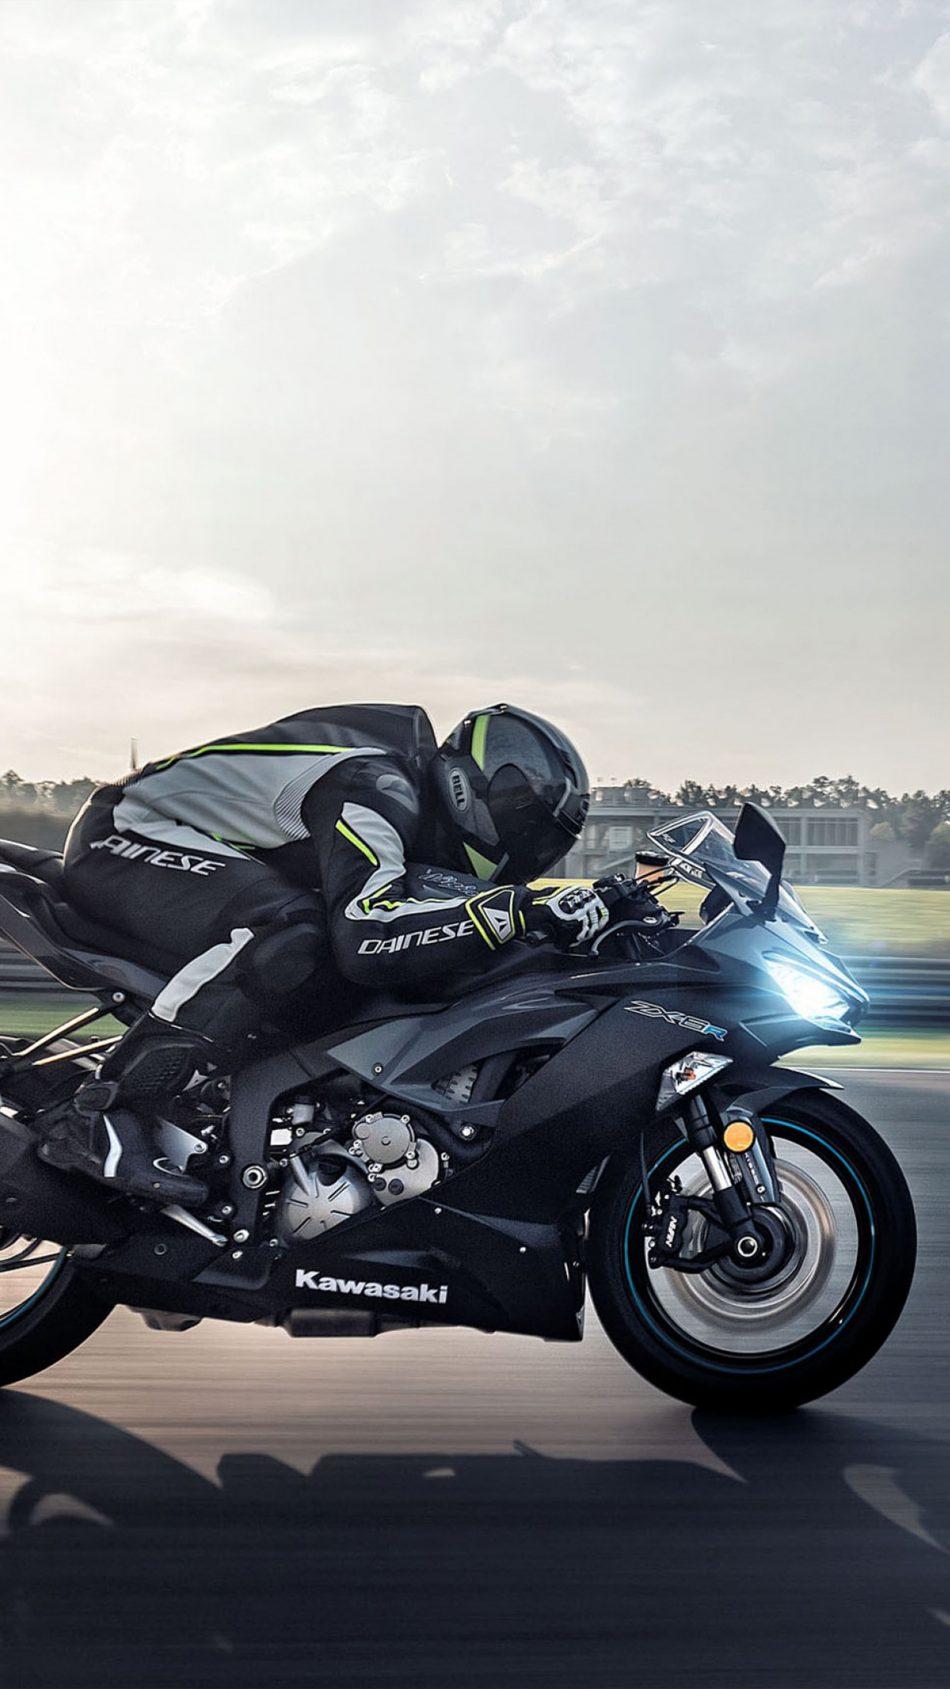 Kawasaki Ninja ZX 6R 2019 Race Track 4K Ultra HD Mobile Wallpaper